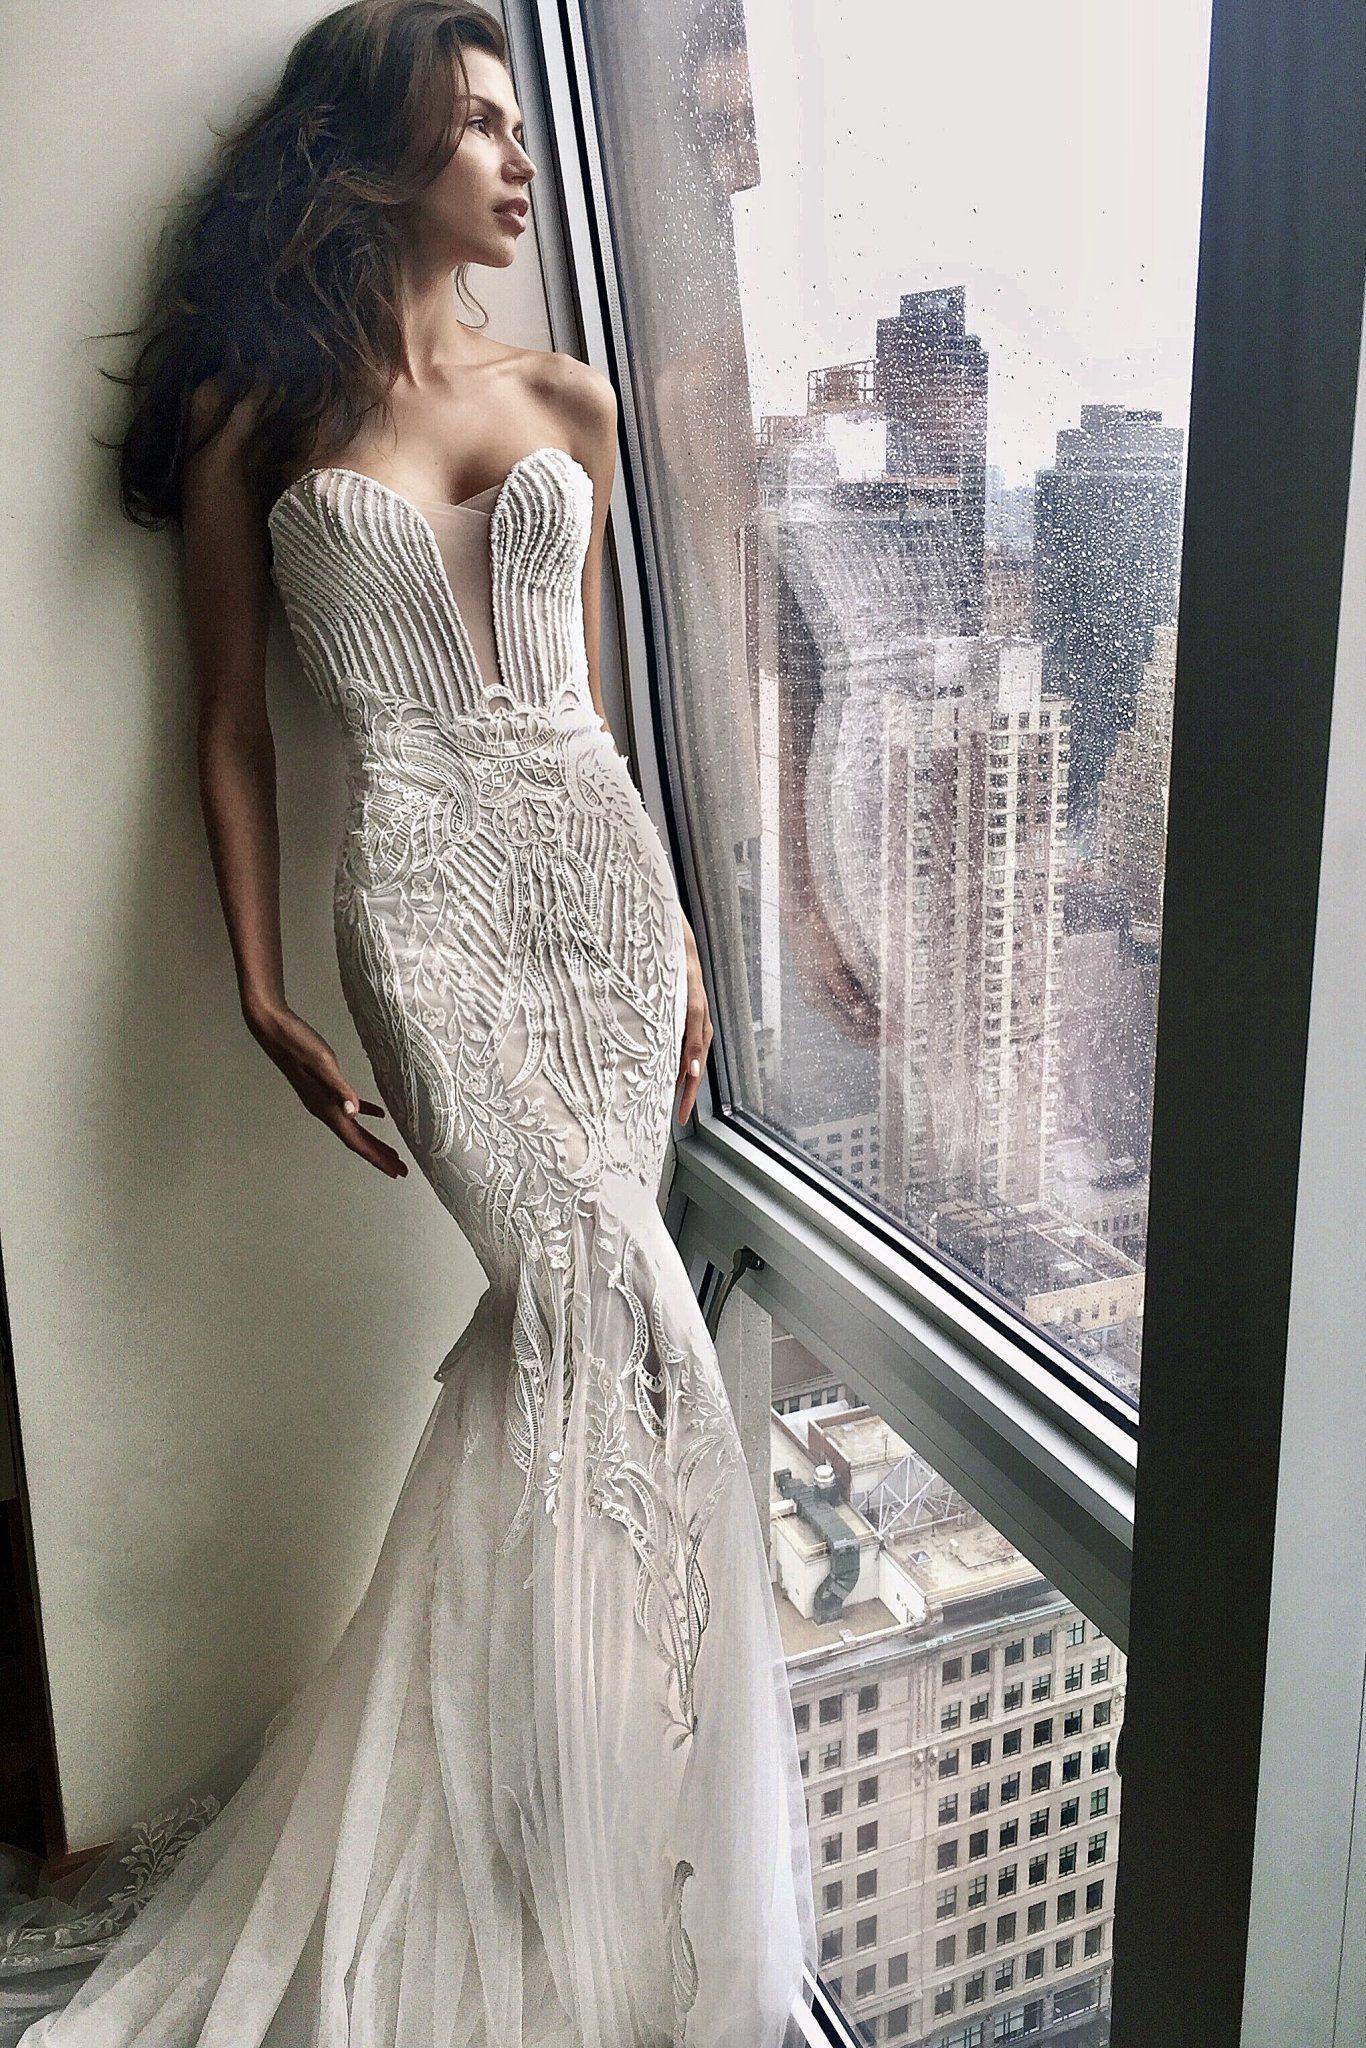 0825ac3685ff0 Pallas Collective Elise wedding dress - at Jessica Haley Bridal   pallascouture  pallasbride  pallascollective  jessicahaleybride